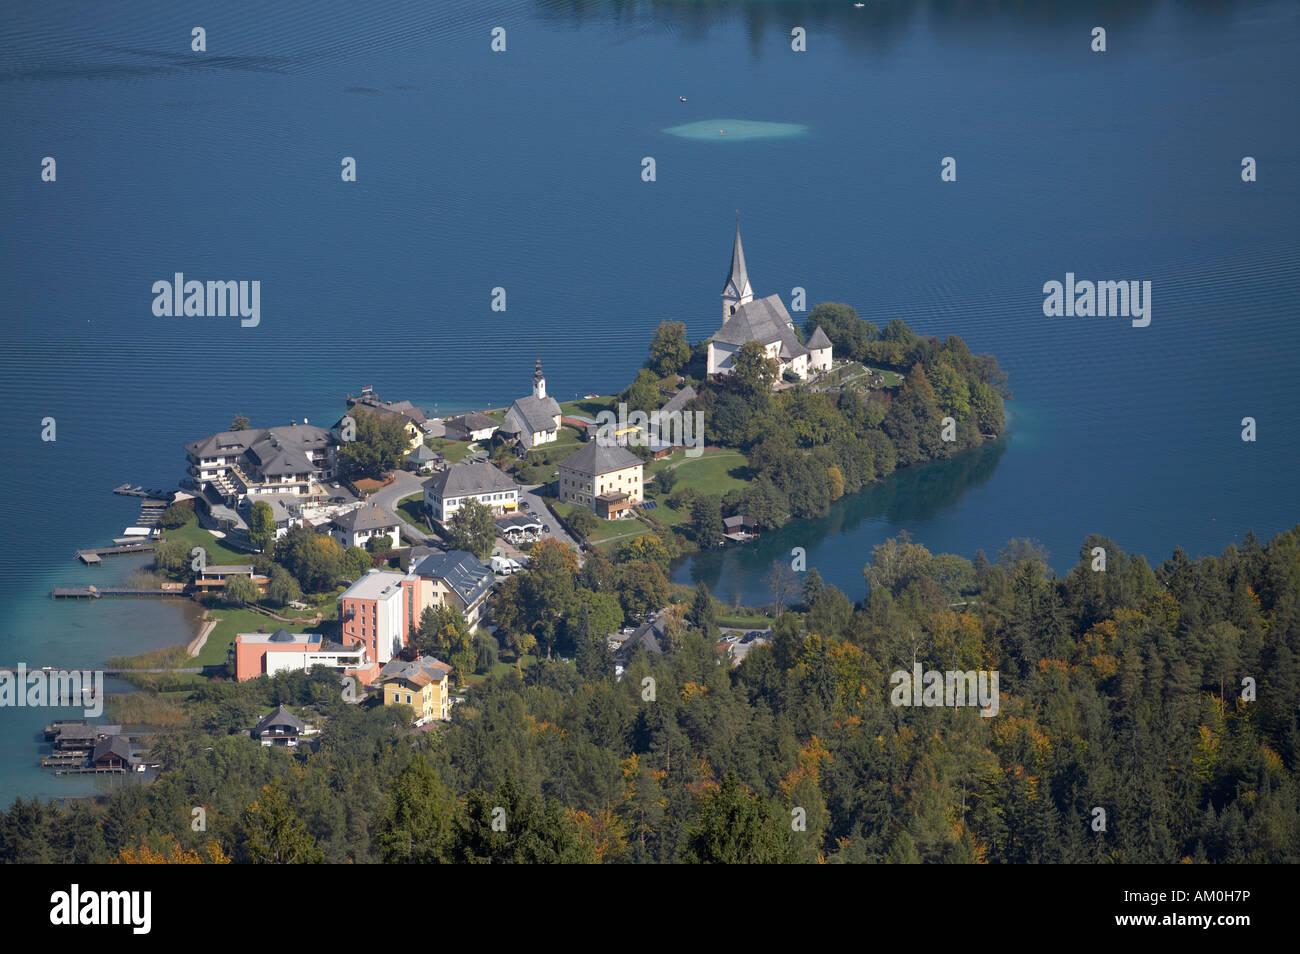 View from Pyramidenkogel to Maria Woerth, Carinthia, Austria Stock Photo